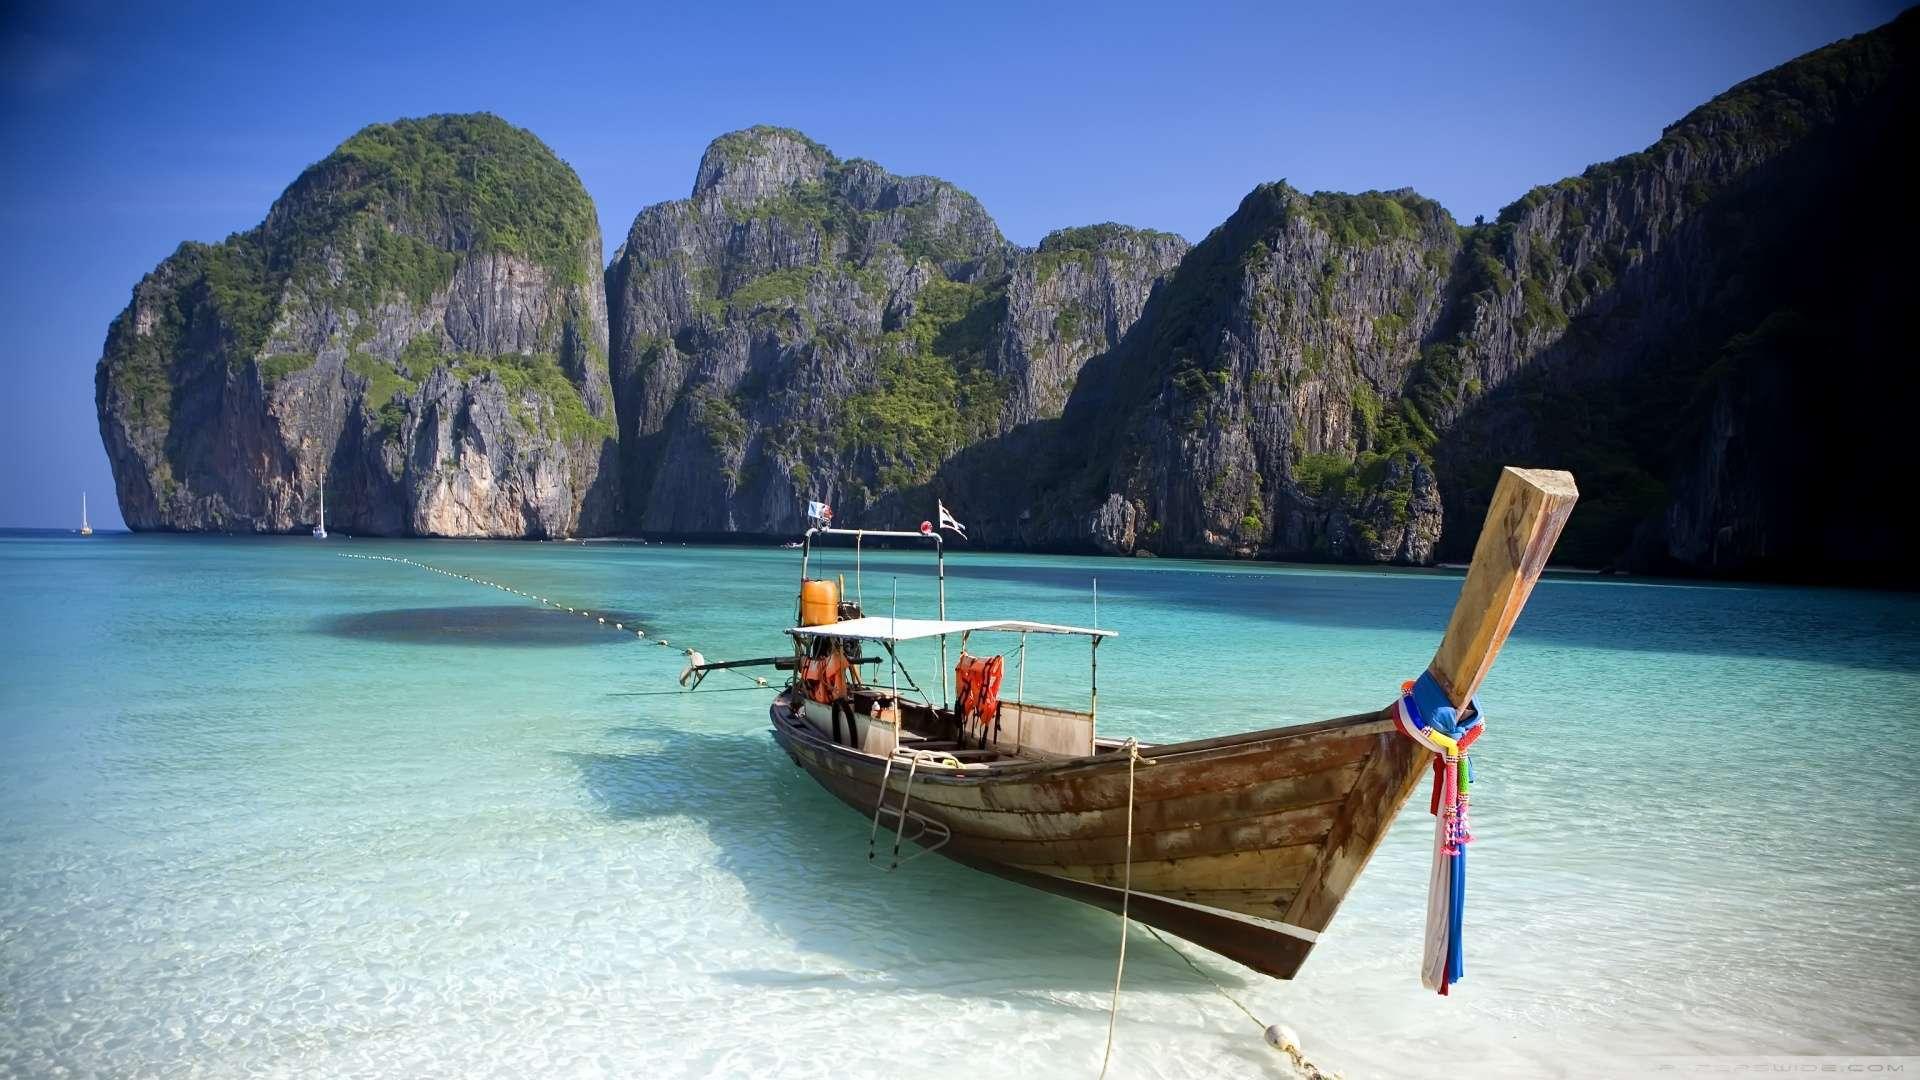 Download now Thailand Beach Wallpaper 1080p HD Read description info 1920x1080